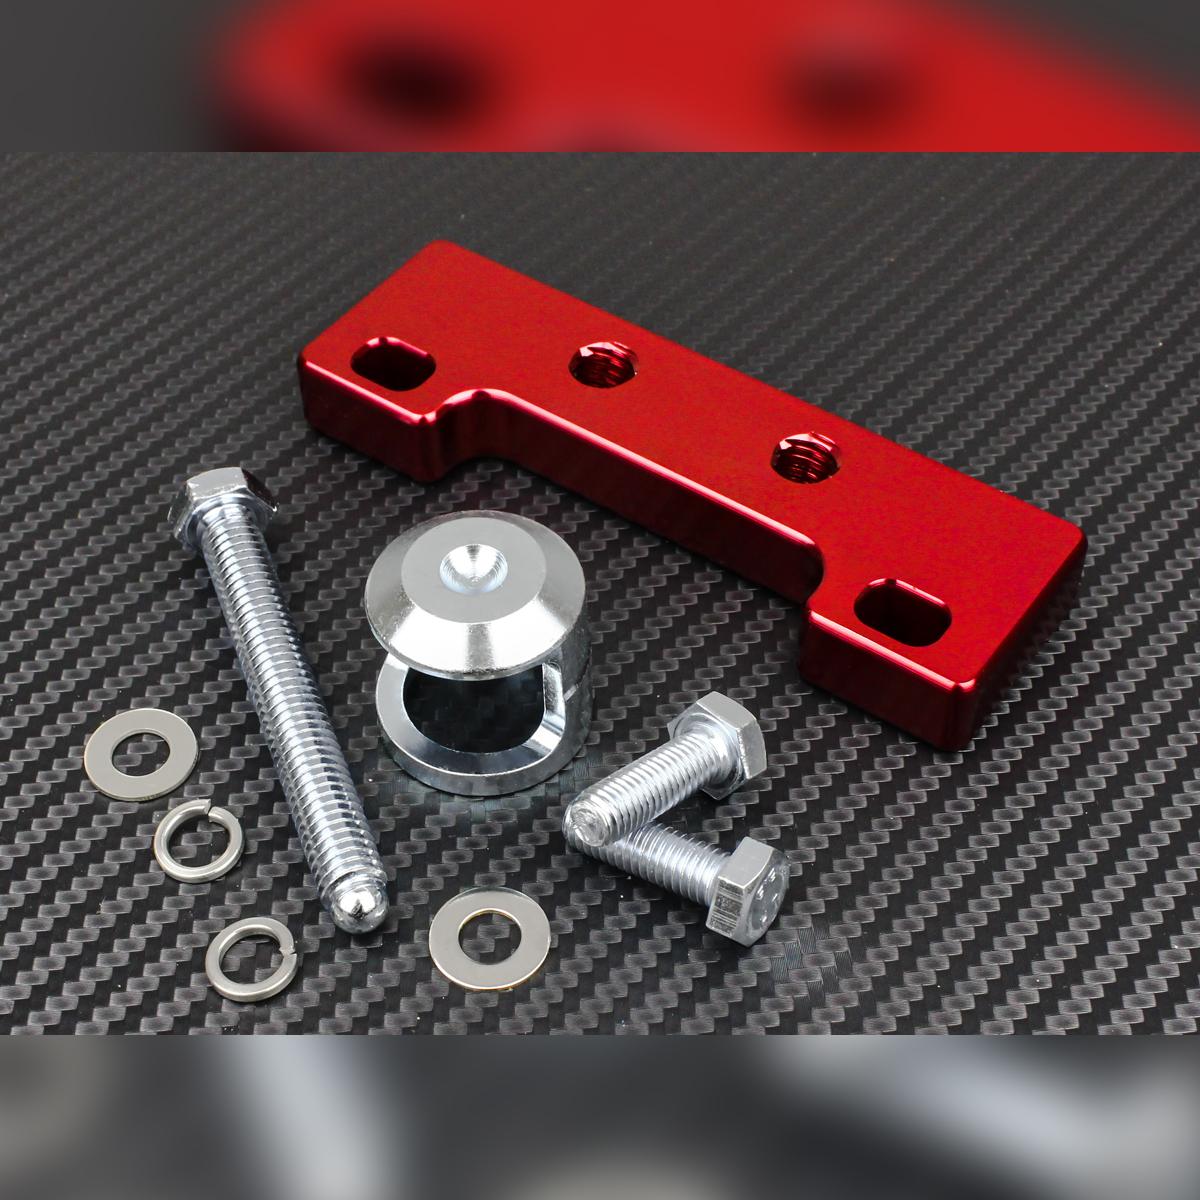 Civic Cylinder Head Removal: Honda Civic Del Sol 1.6L Ferio B16a VTEC Valve Spring